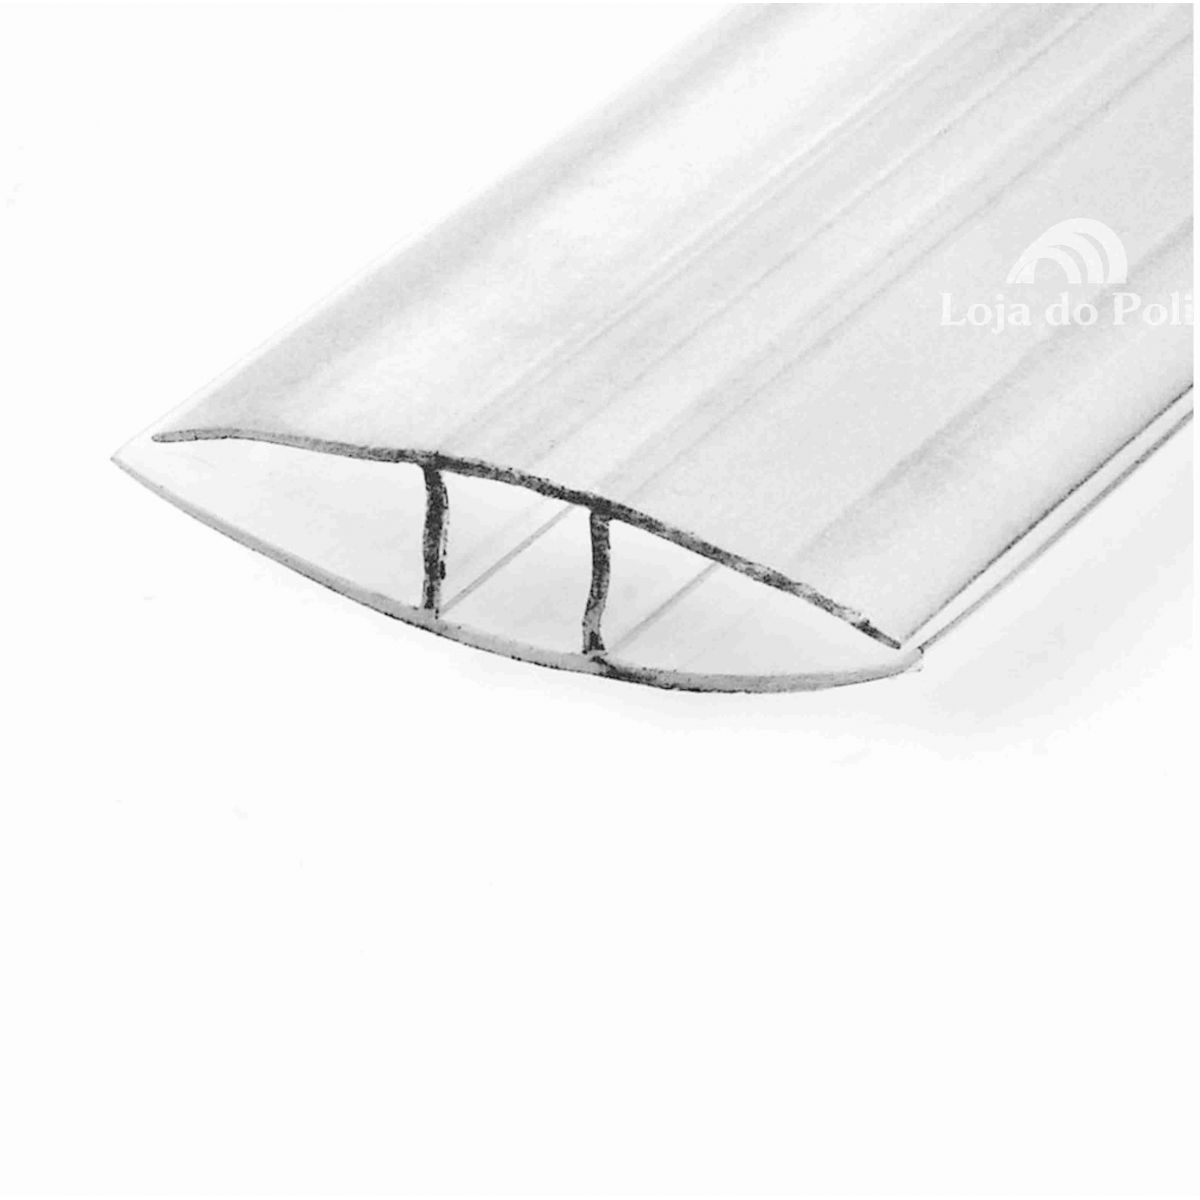 Emenda Rápida Cristal/Incolor Para Policarbonato 4 / 6 ou 10mm - 6 Metros